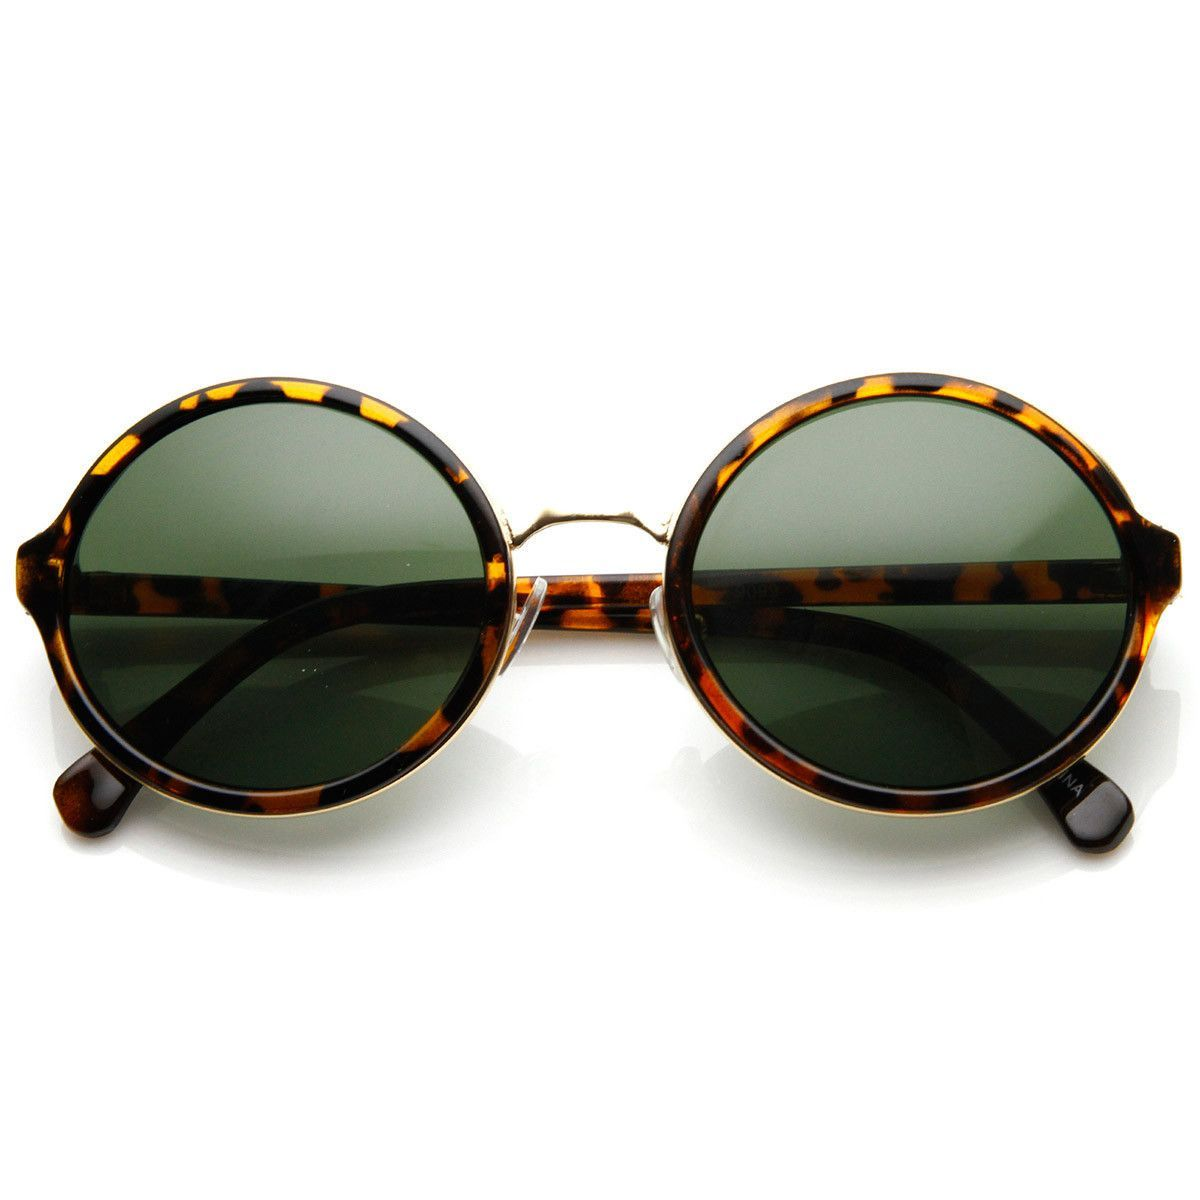 Vintage Steampunk Classic Round Sunglasses Metal Bridge 8407